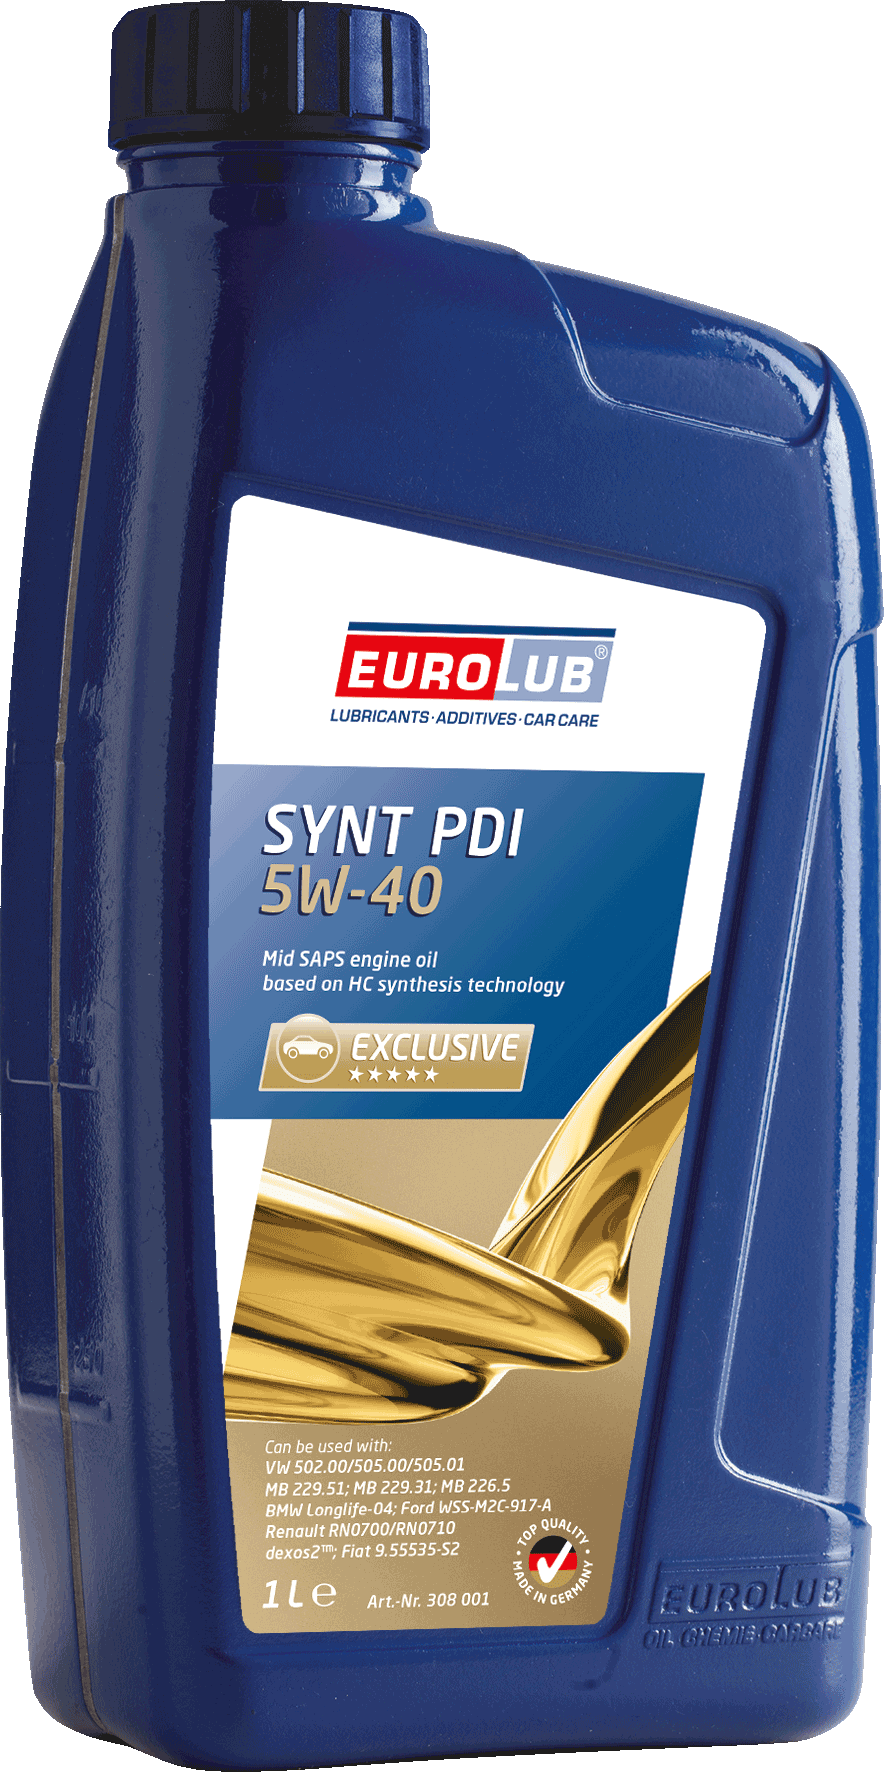 EUROLUB   SYNT PDI SAE 5W/40 (синтетическое, Mid SAPS), 1л